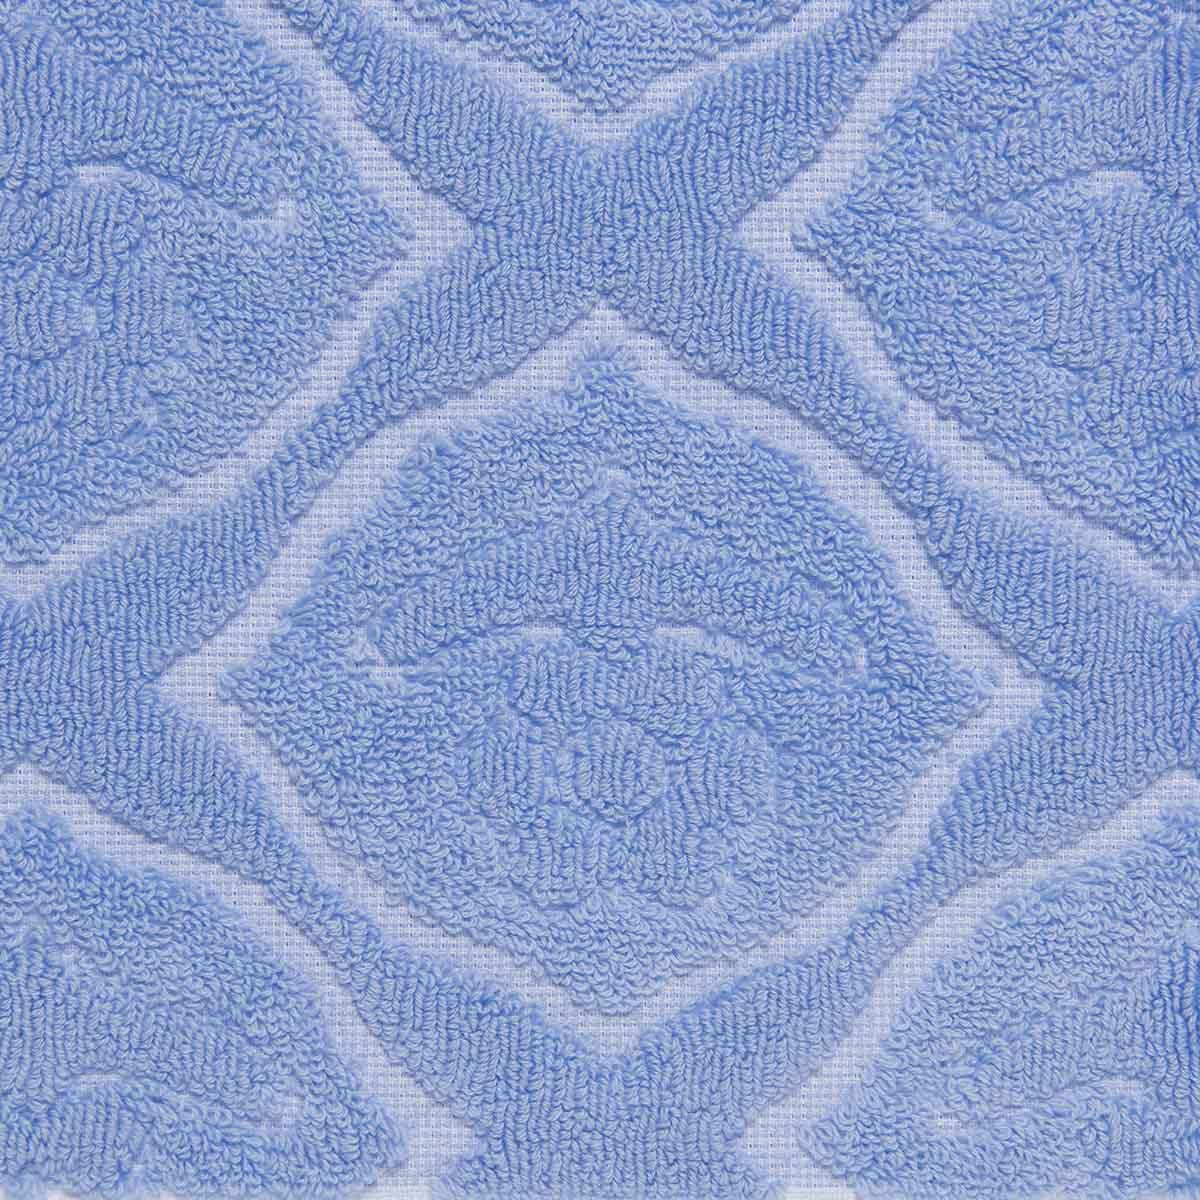 Guest Towel - Ottoman Rose / Blue